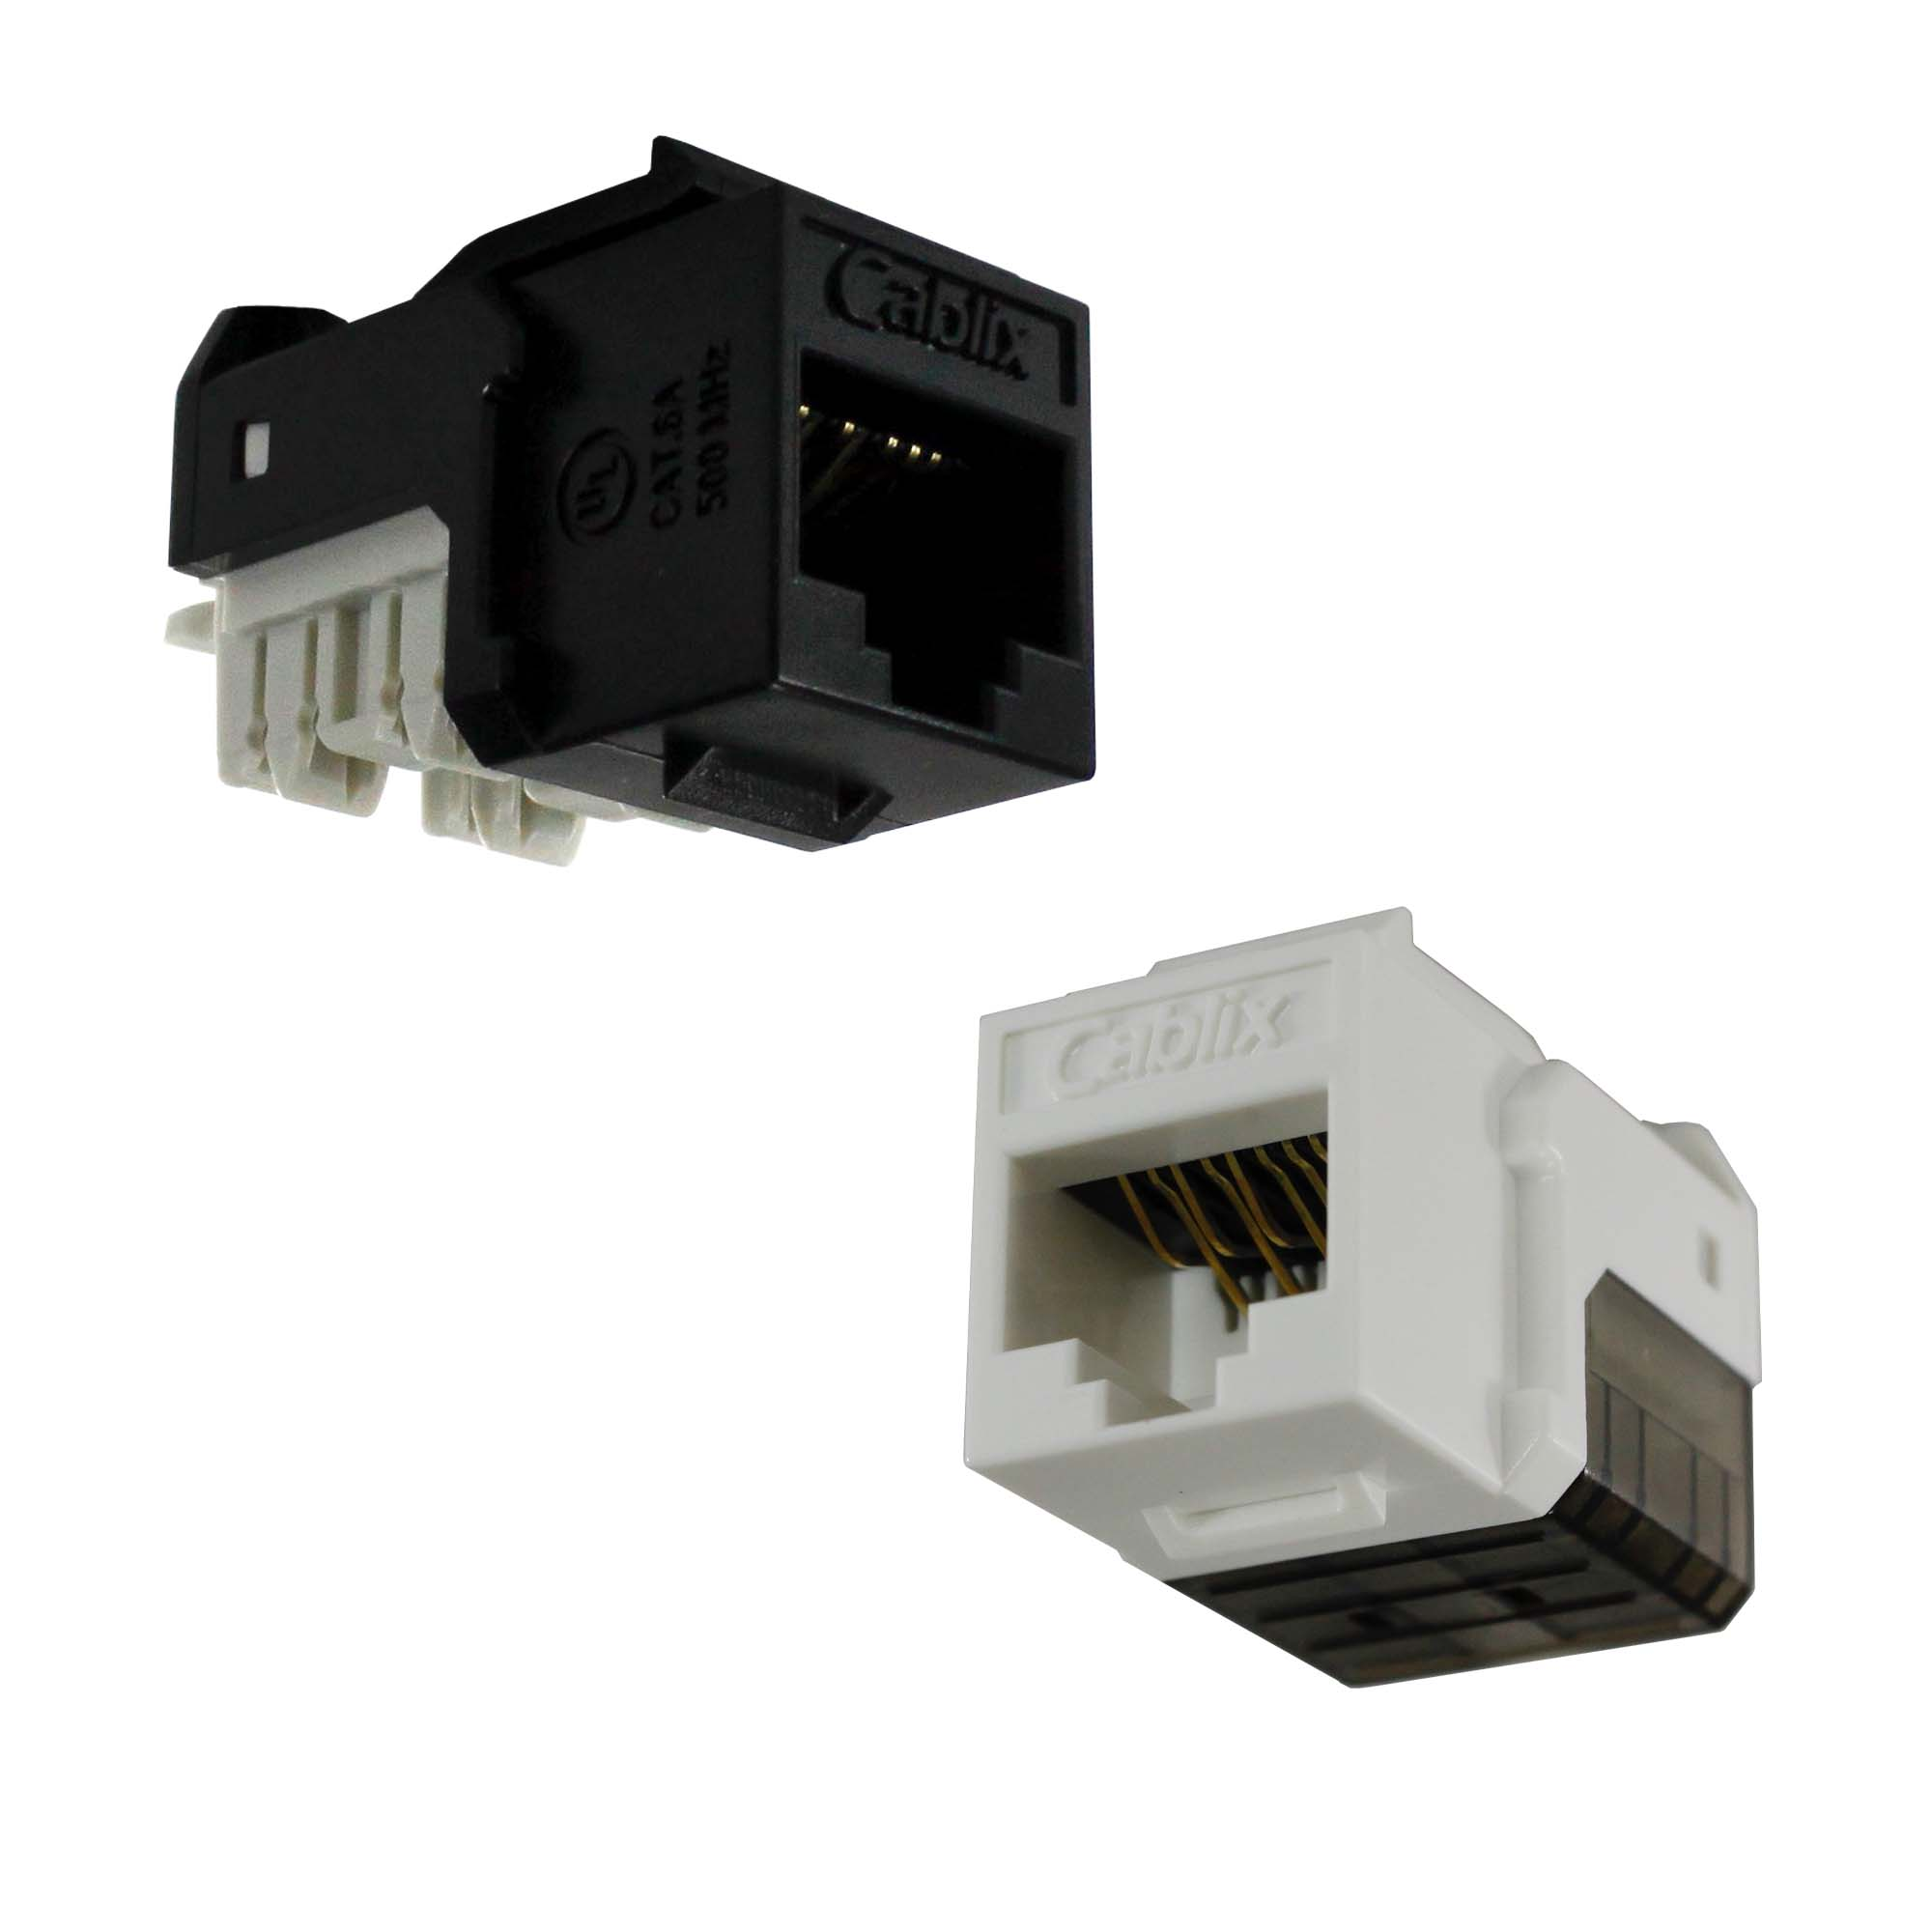 keystone jack technical information t568a \u0026 t568b wiring T568A vs T568B 6a keystone jack technical information t568a \u0026 t568b wiring